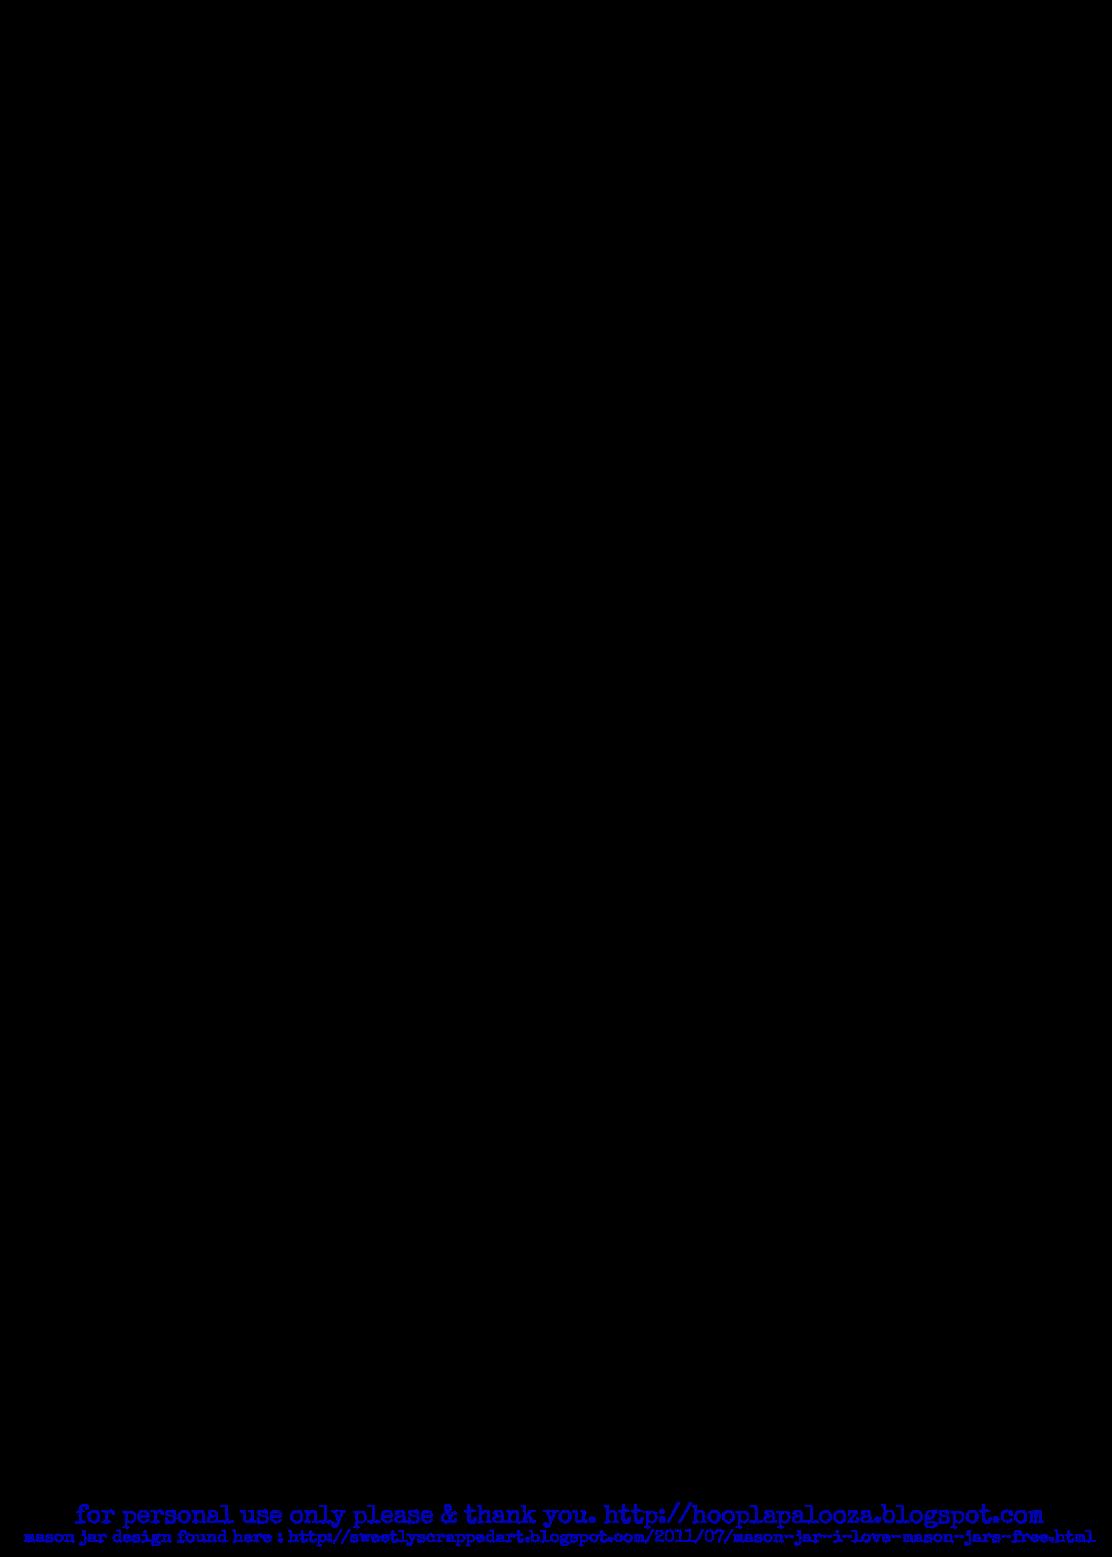 Mason Jar Outline The Original Mason Jar With Handle Outline